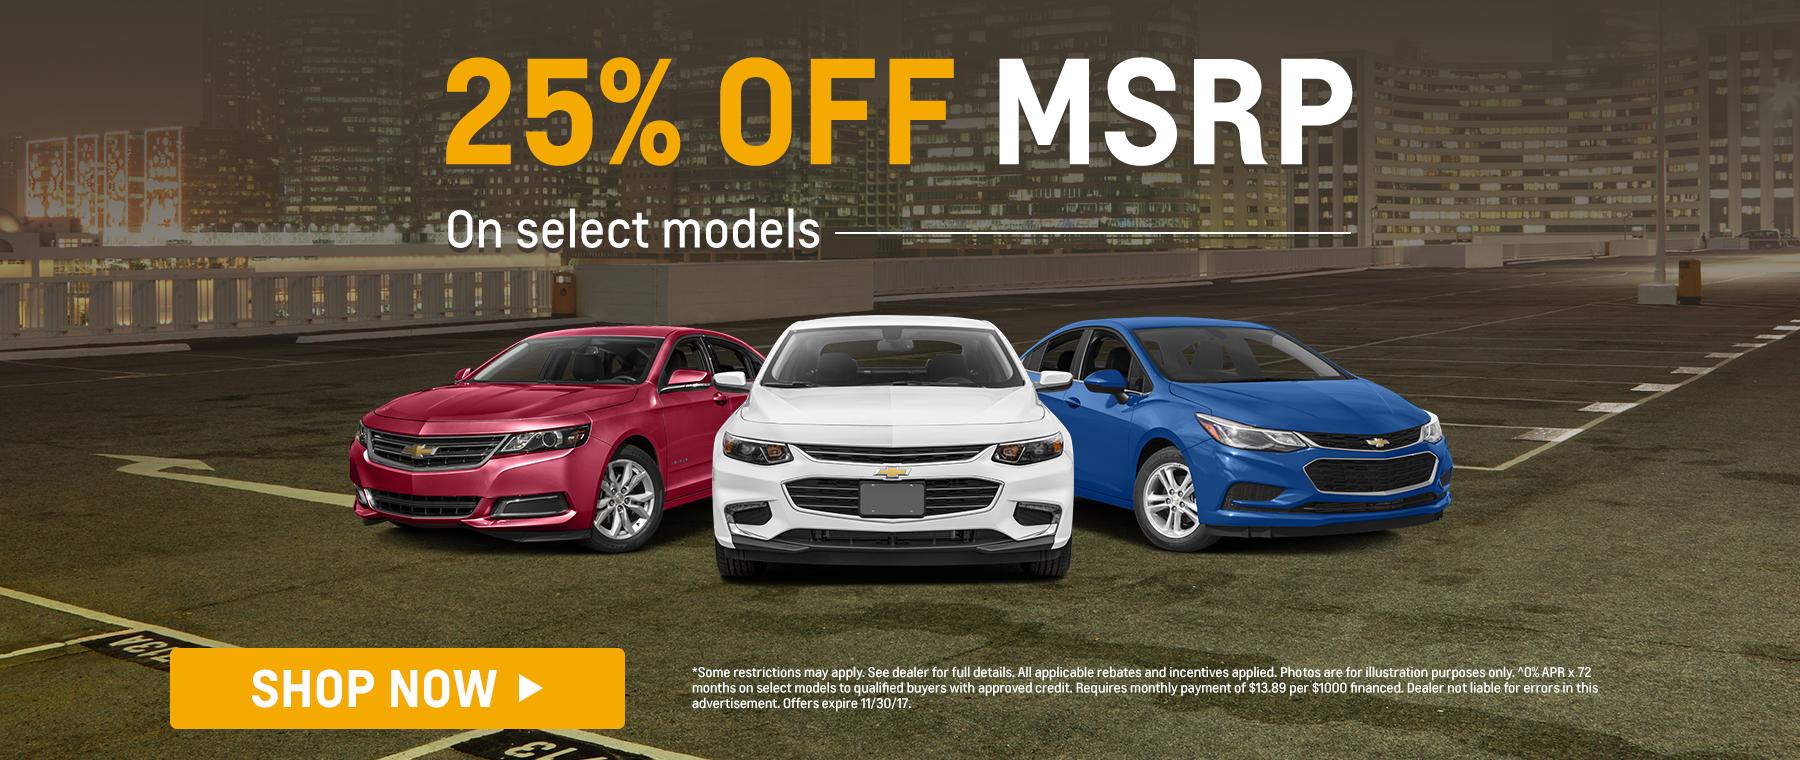 25% Off MSRP